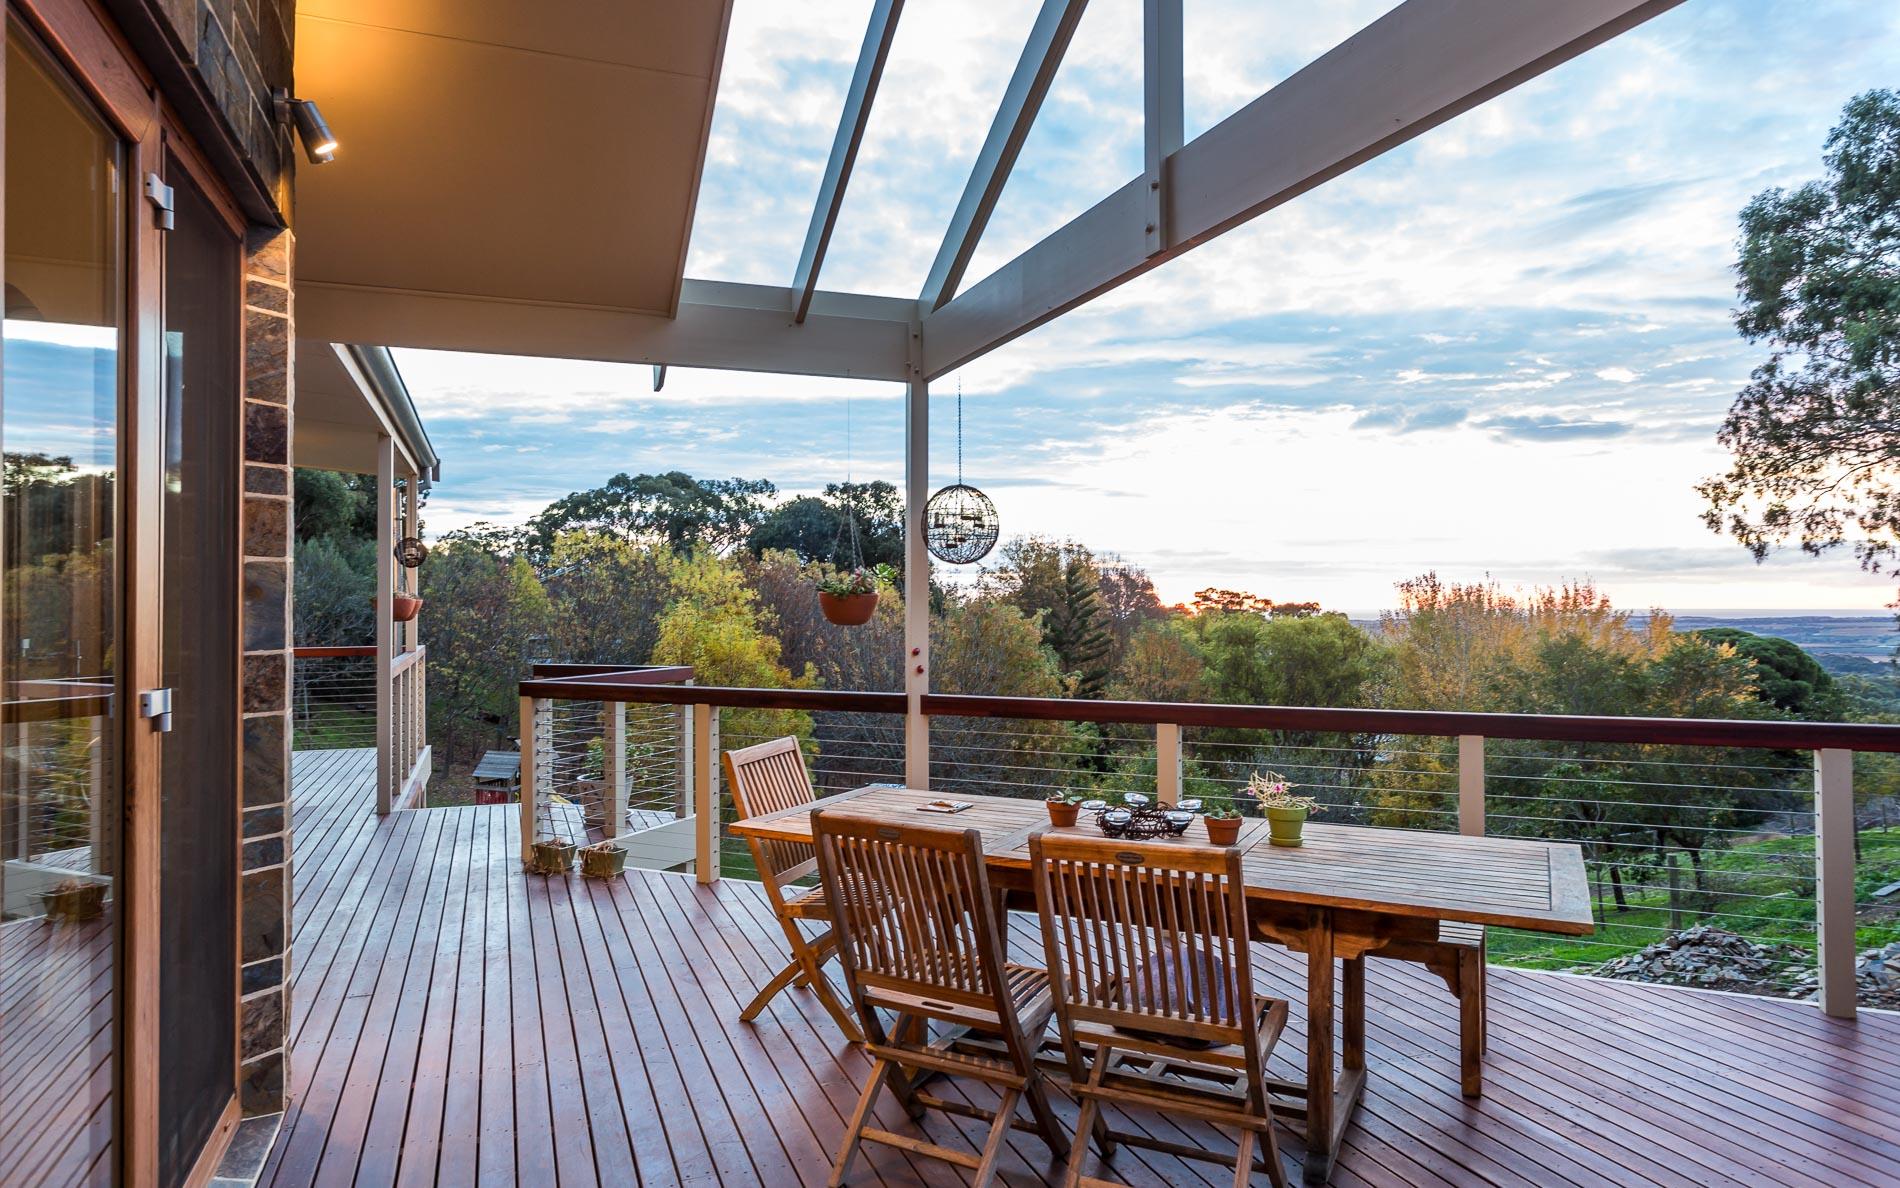 Custom Home, Renovation, Extensions, Restoration, Builders, Design, Willunga, Fleurieu, Decking, Outdoor Living, Balustrades, Beautiful View